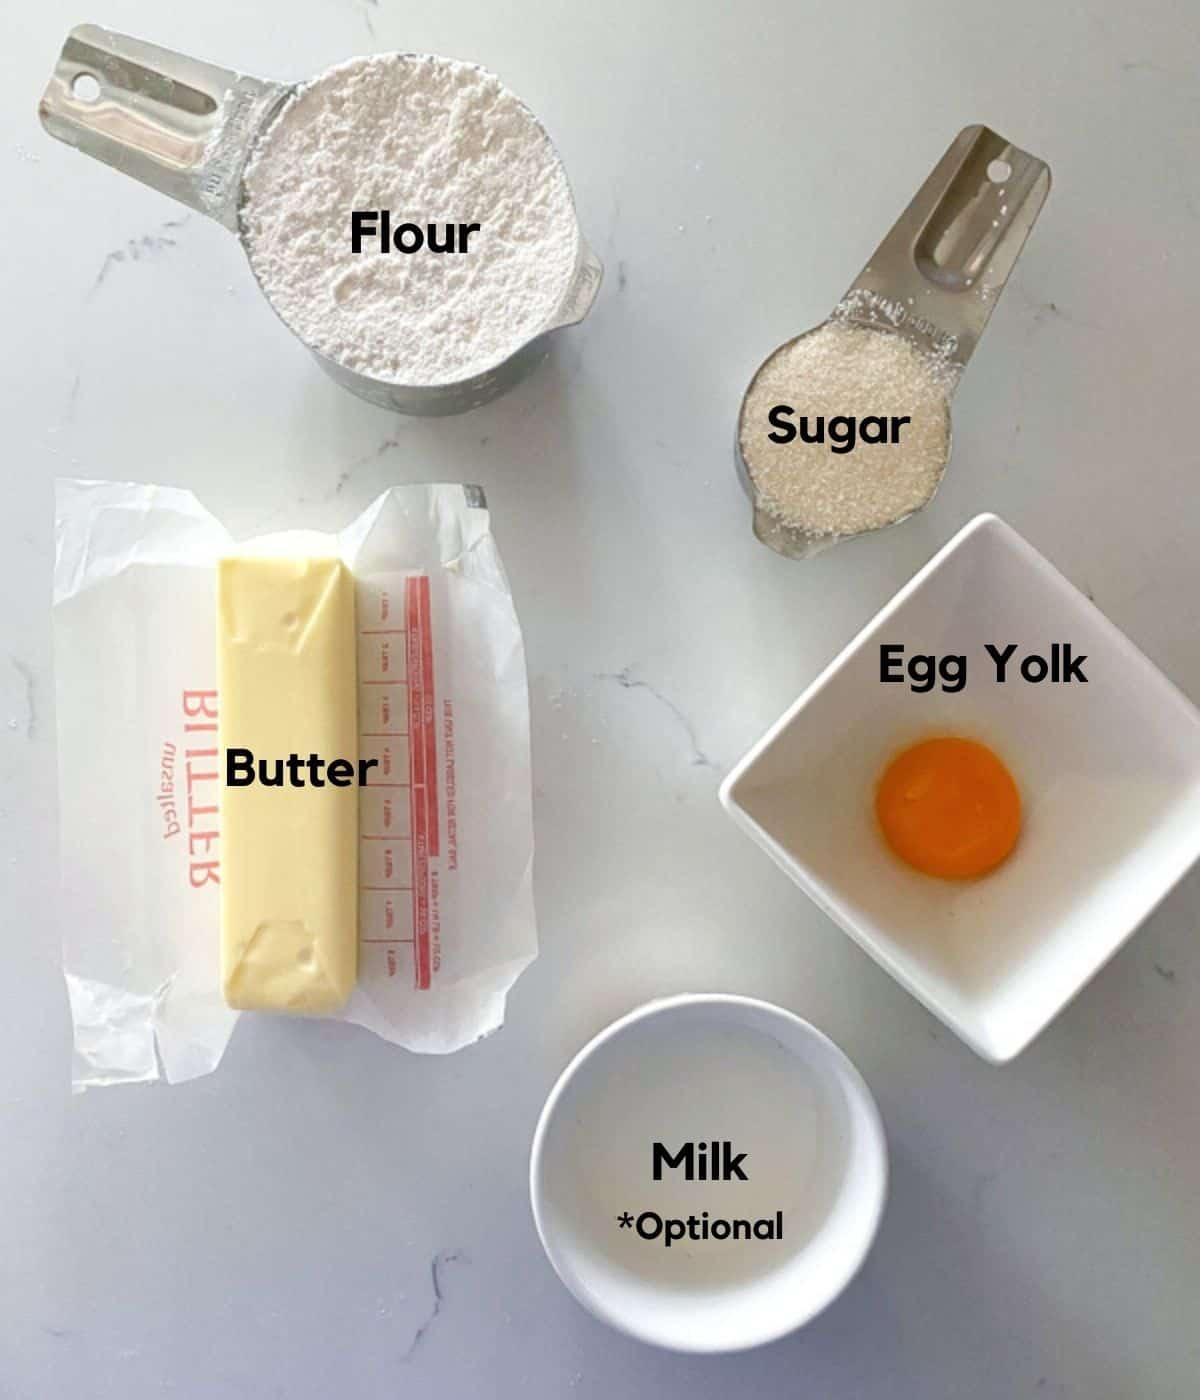 Egg custard tartlet dough ingredients on a table including flour, sugar, butter, egg yolks and milk.